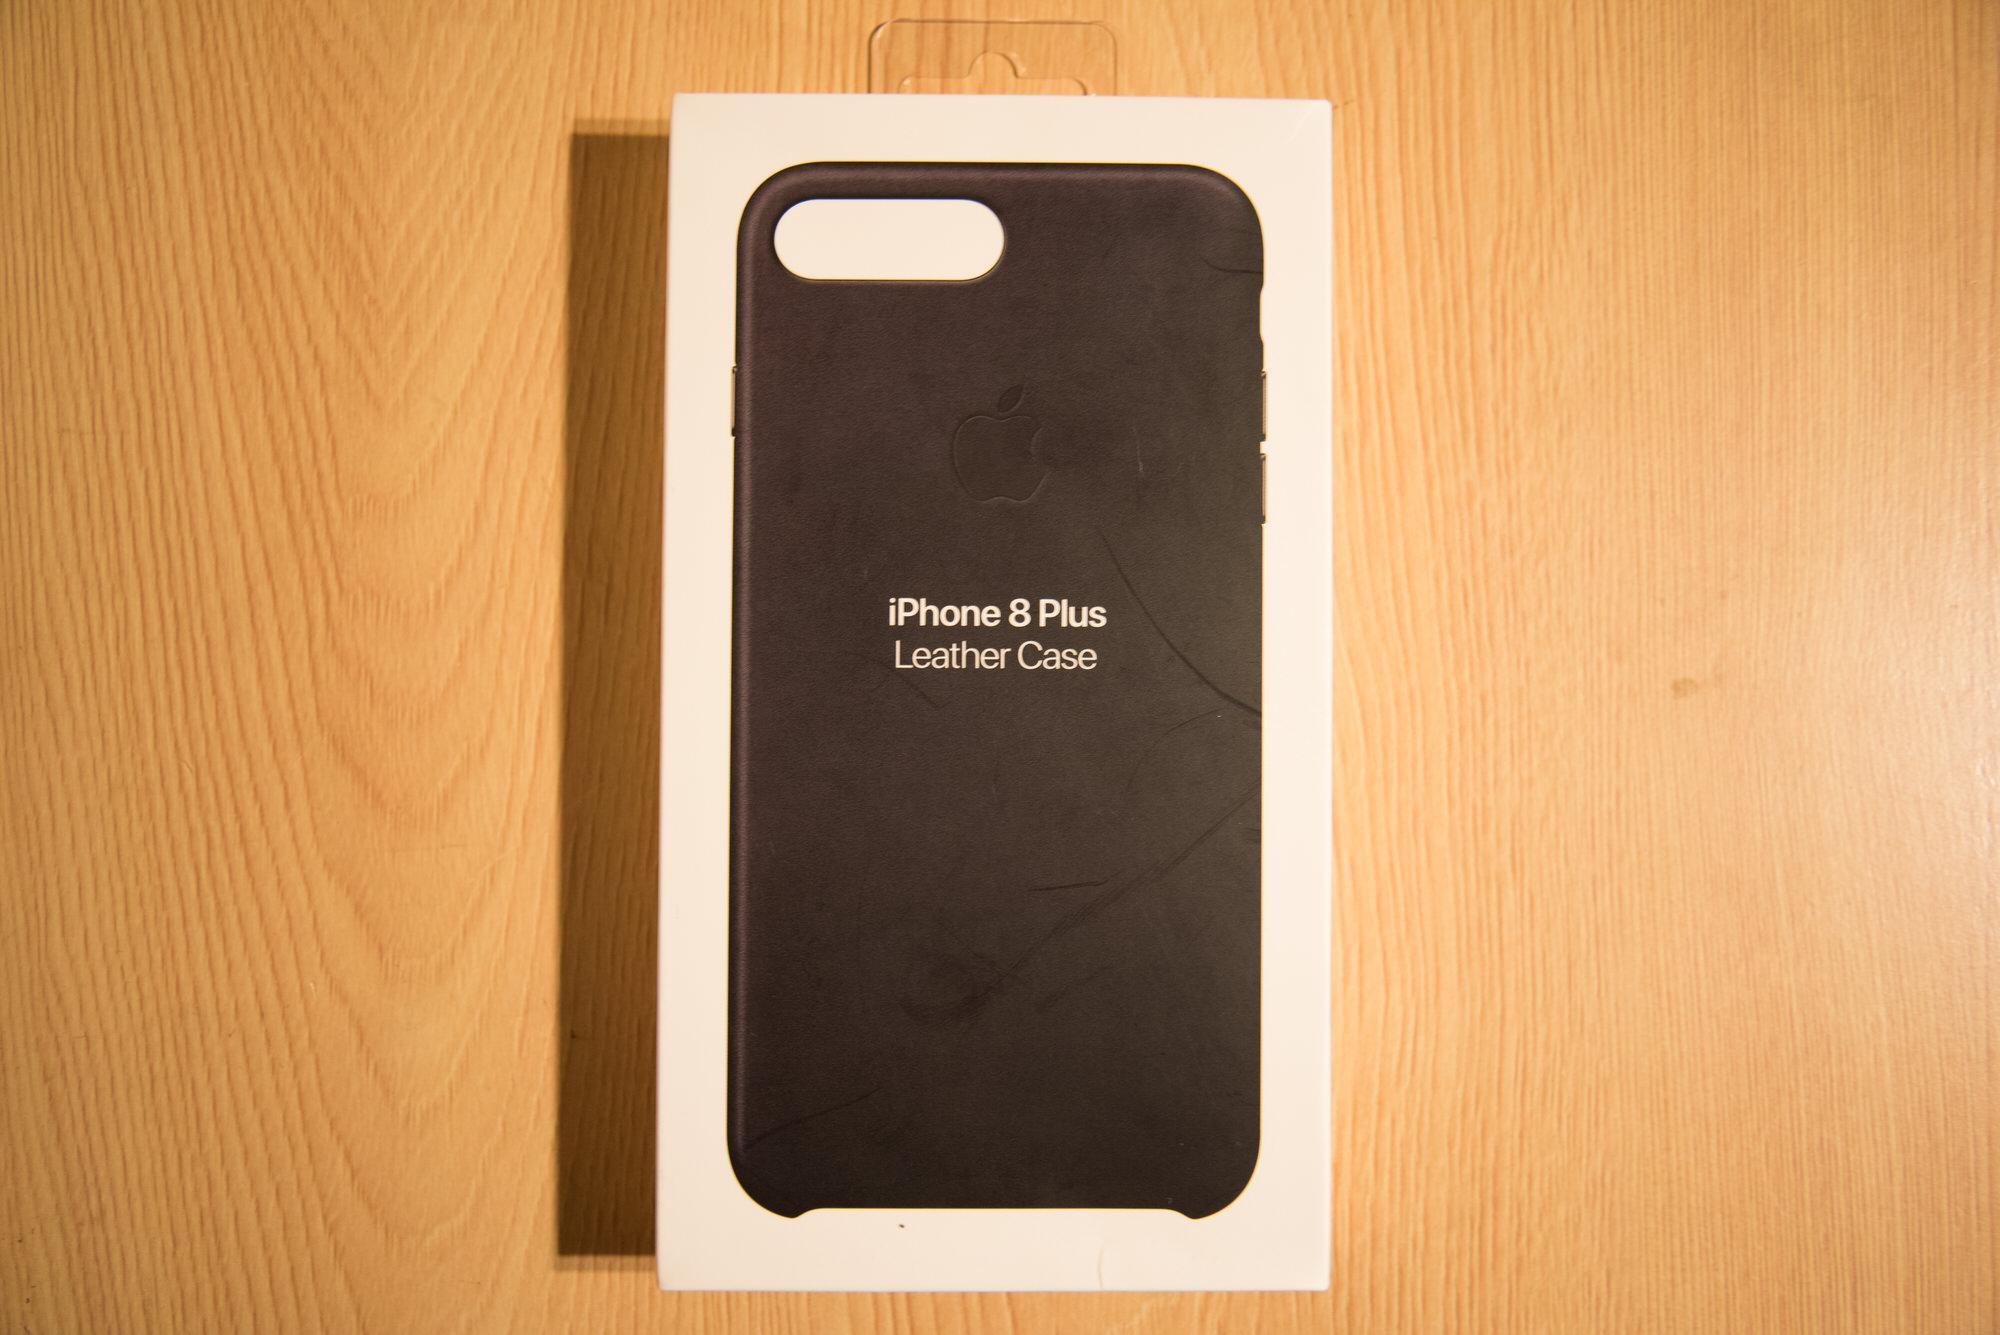 Iphone7plus leathercase 1